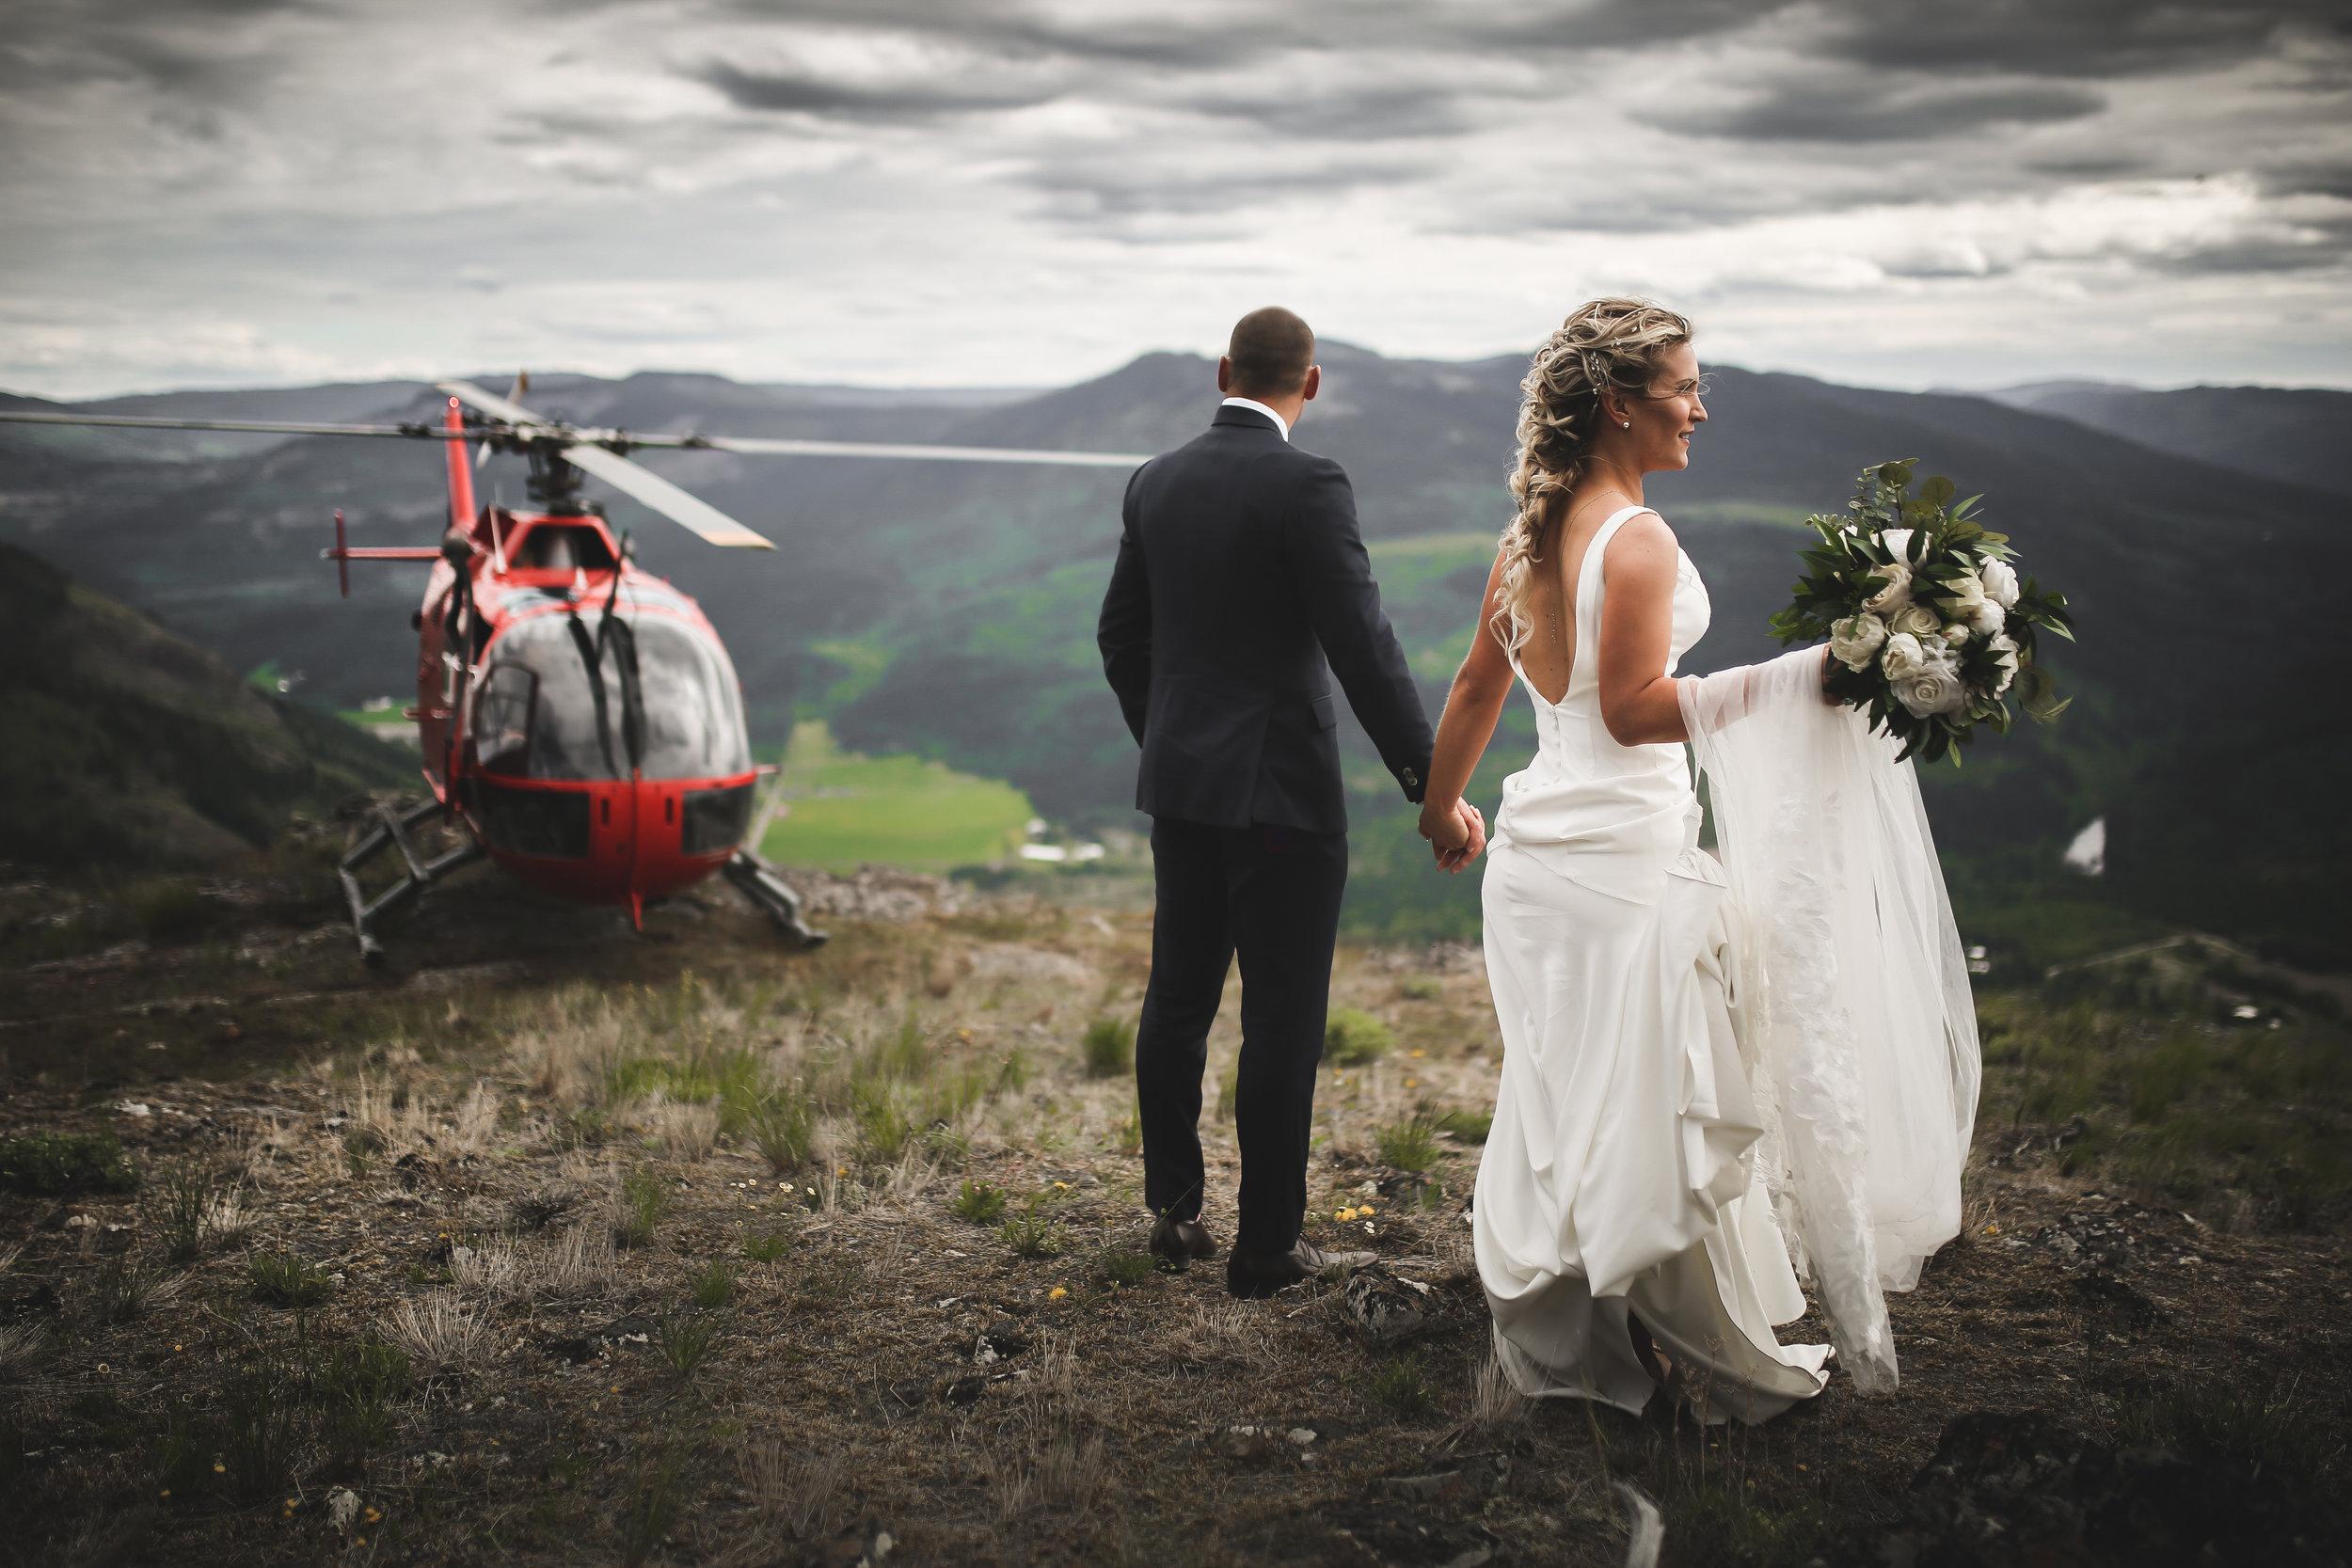 11 Adam Ziorio Photography - Kate & Ben's Wedding.jpg